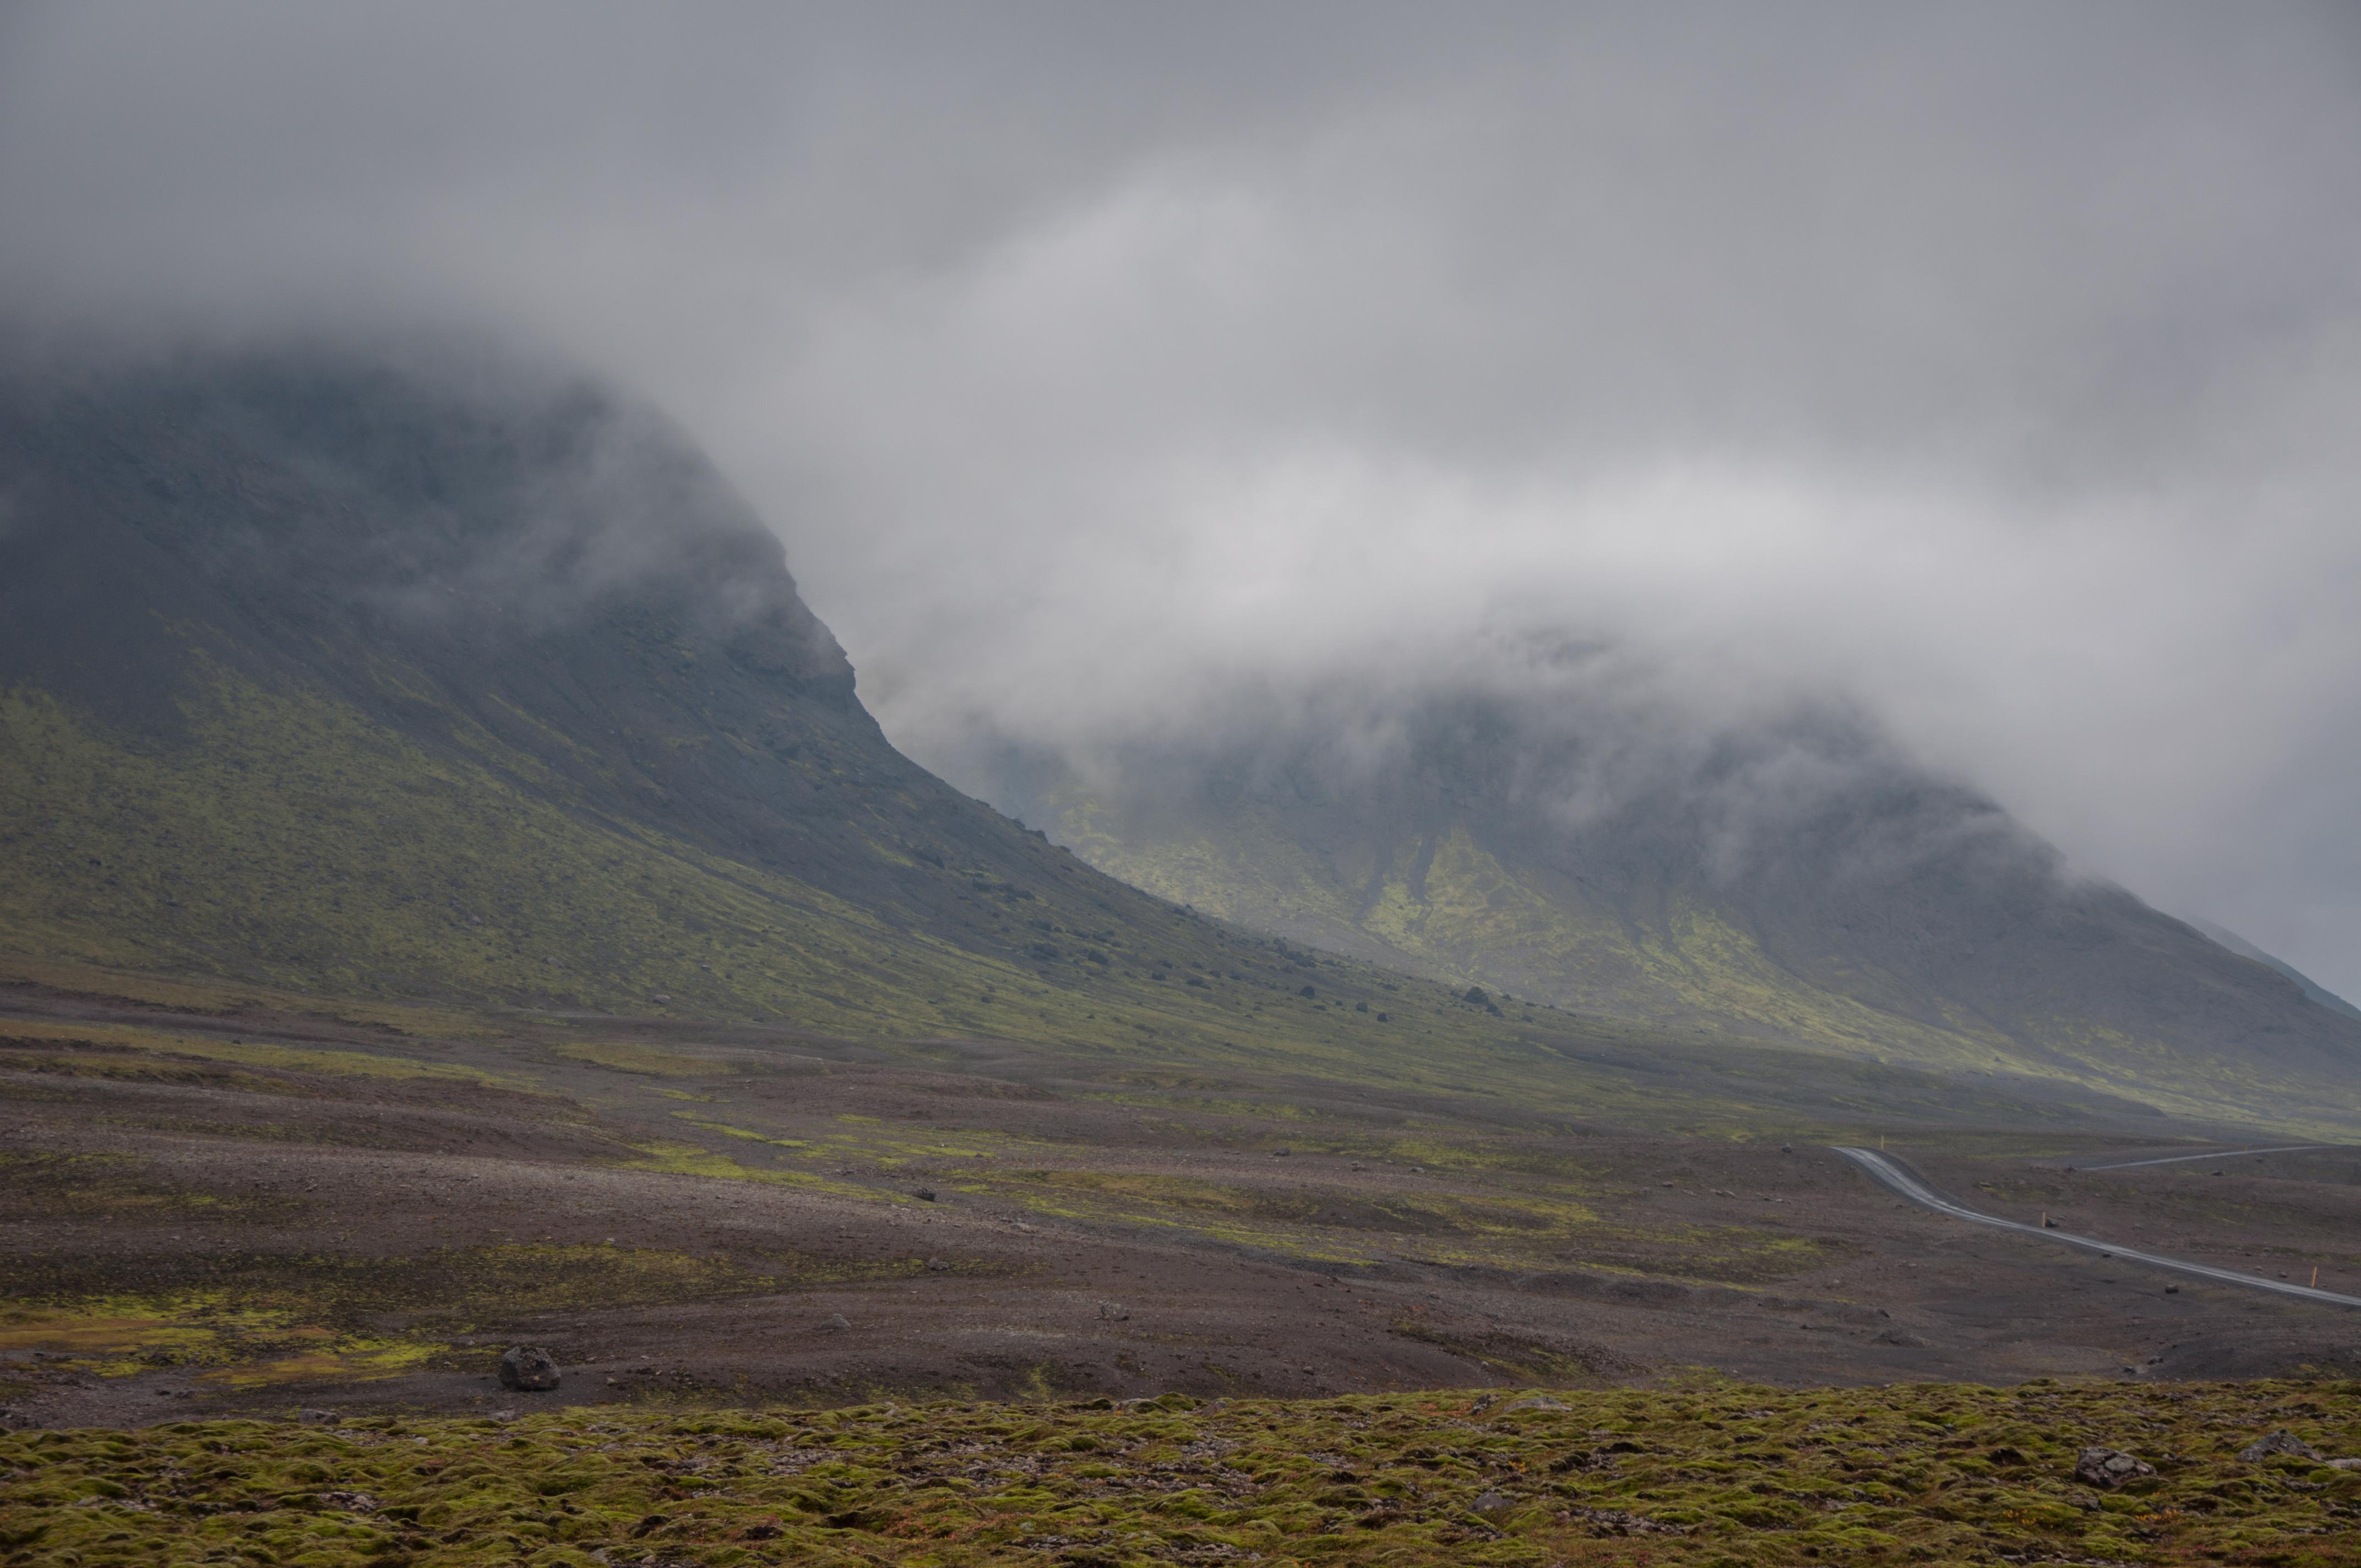 2014-09-18_16-47-44_Iceland_Suðurland_Reykholt_Road_F35